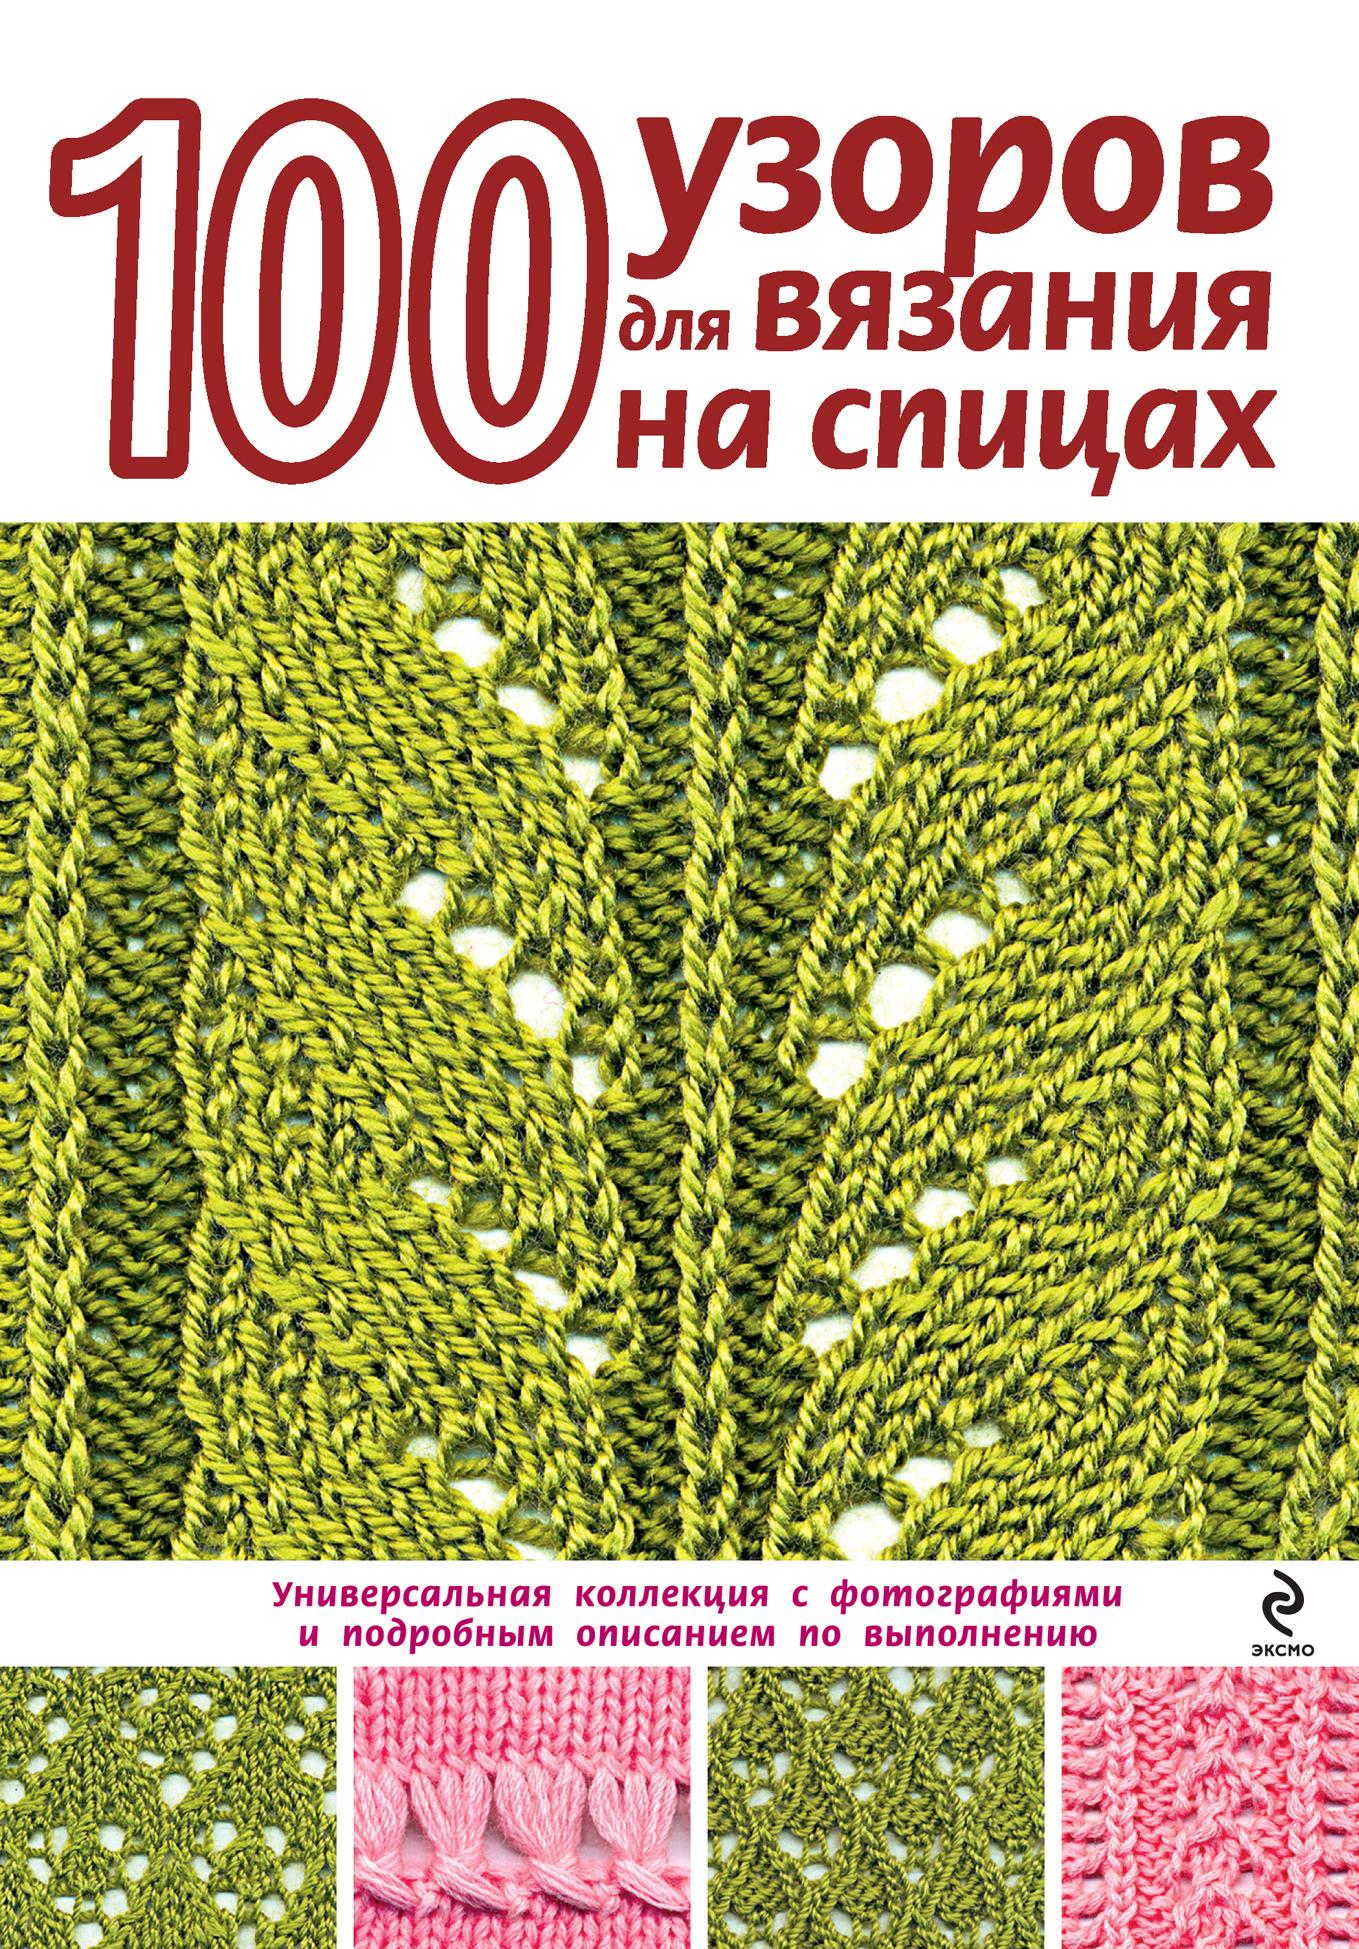 100 ������ ��� ������� �� ������